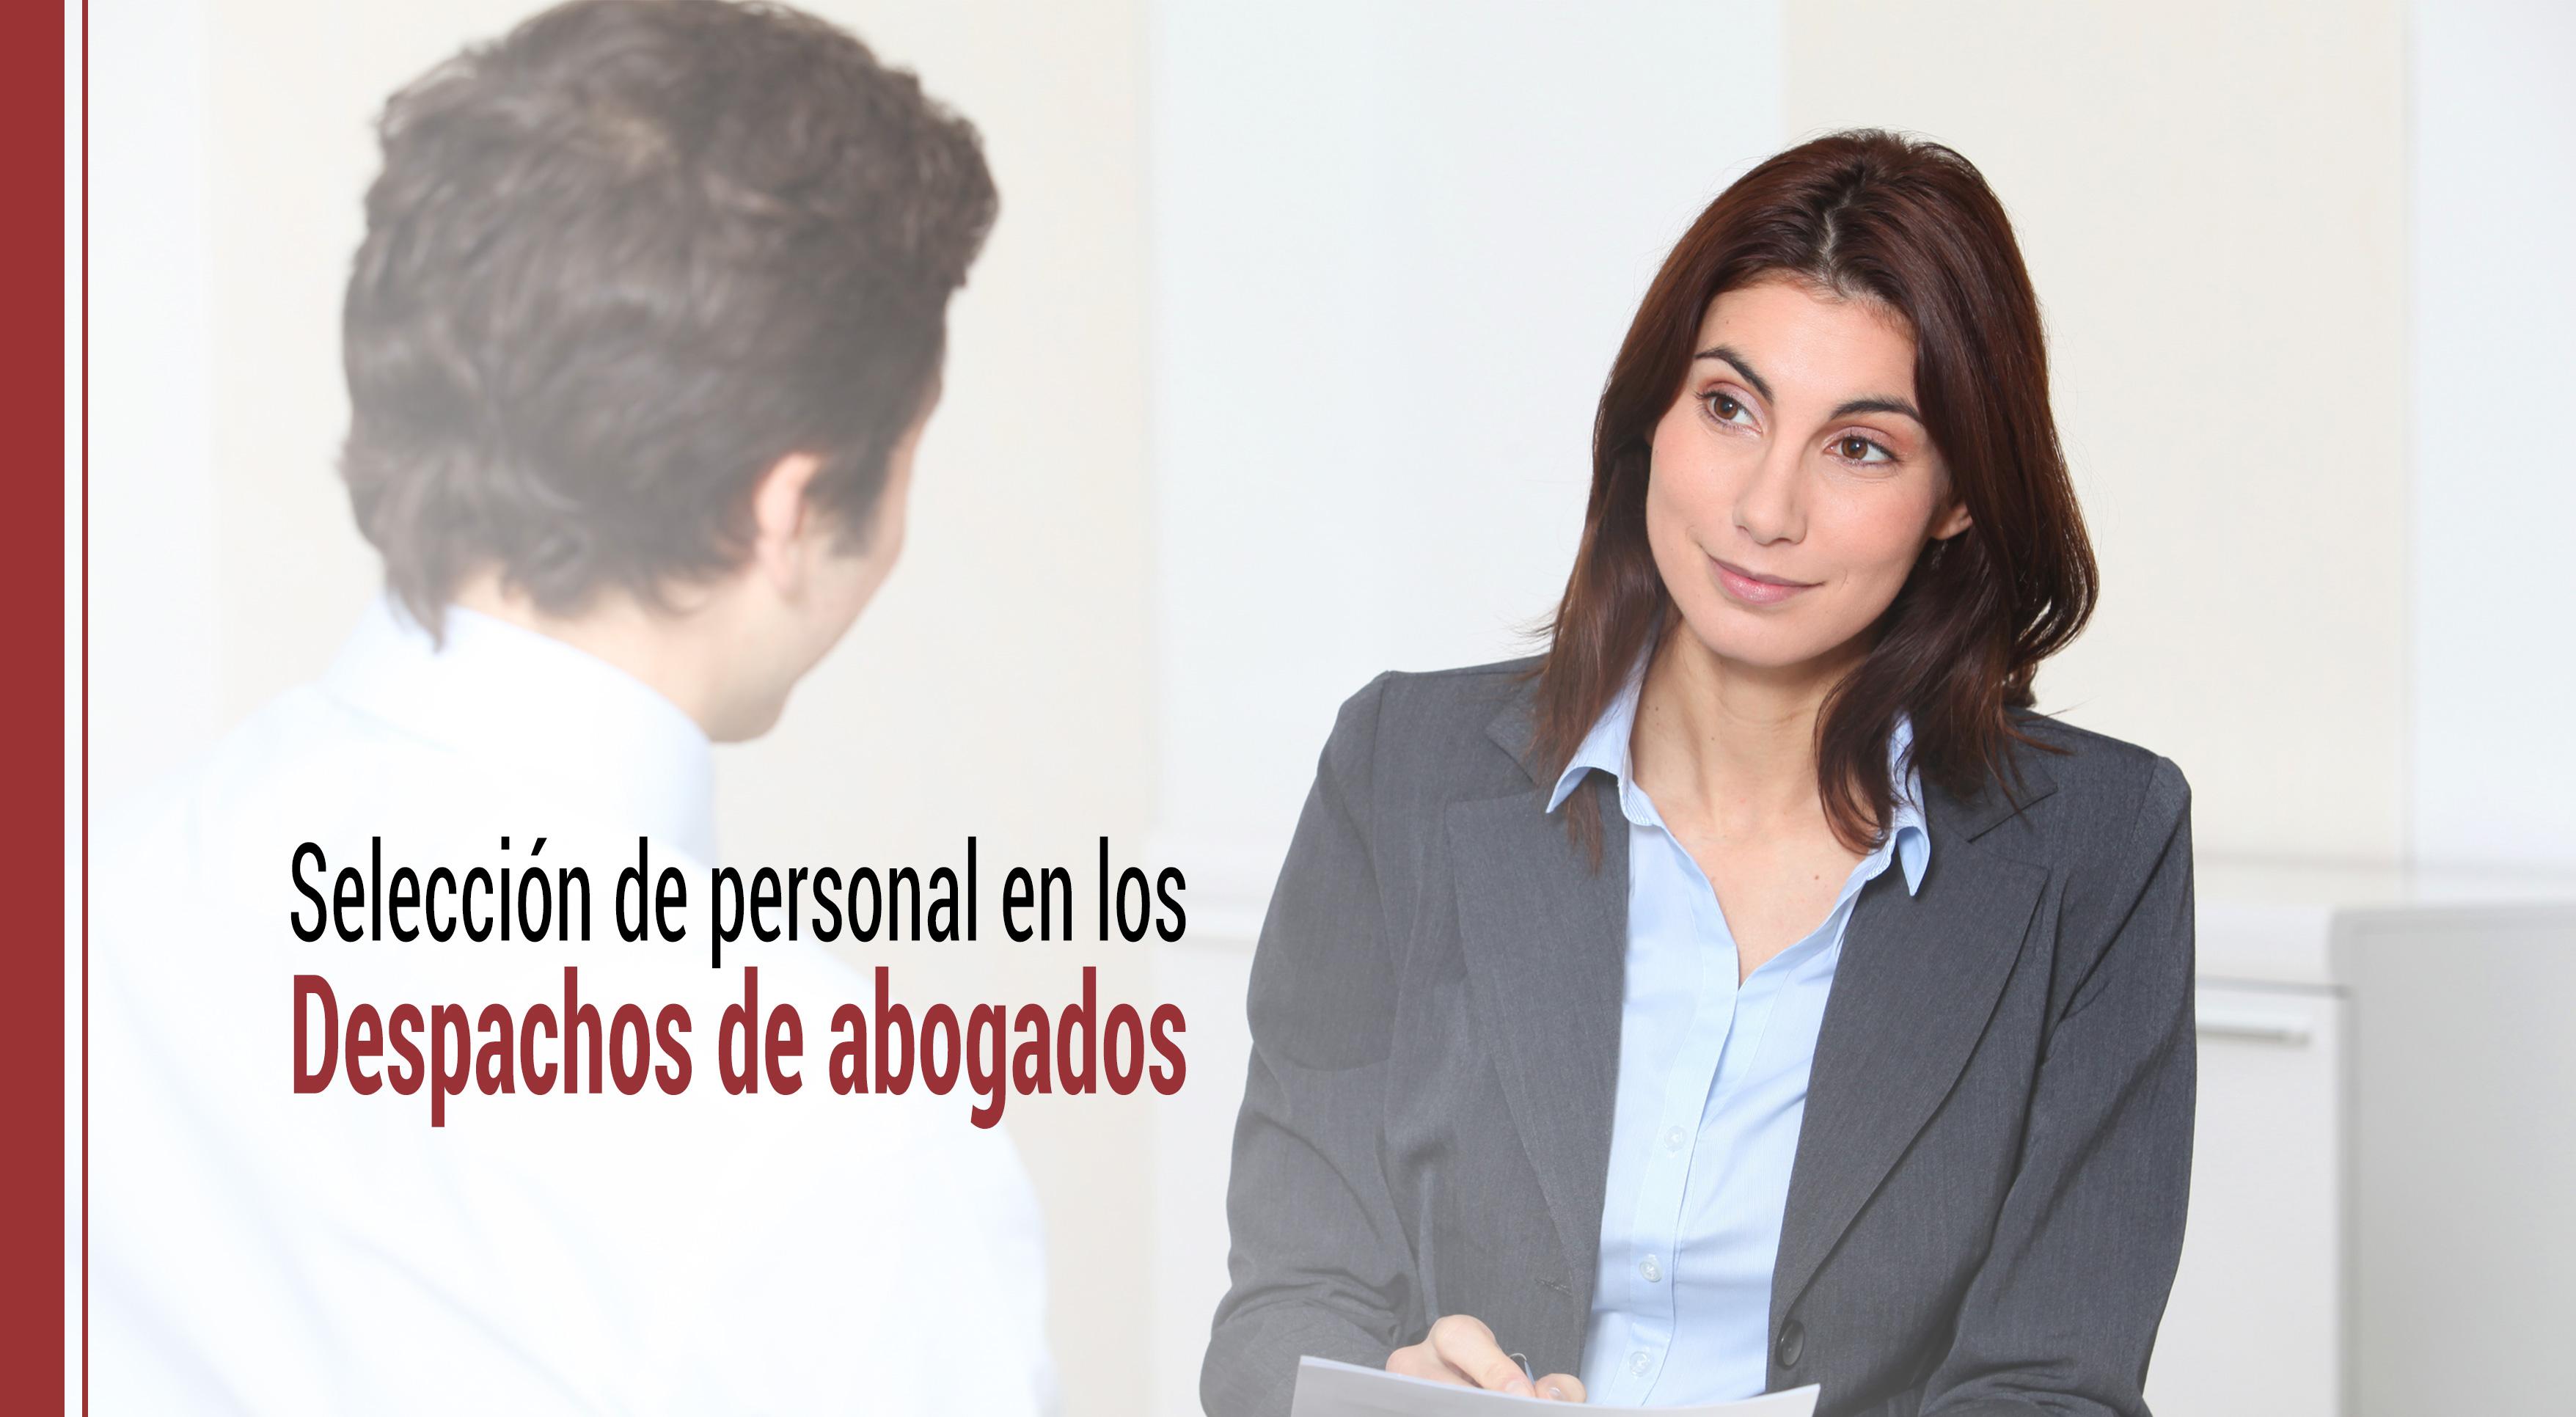 seleccion-de-personal-despachos-abogados Selección de personal en los grandes despachos de abogados